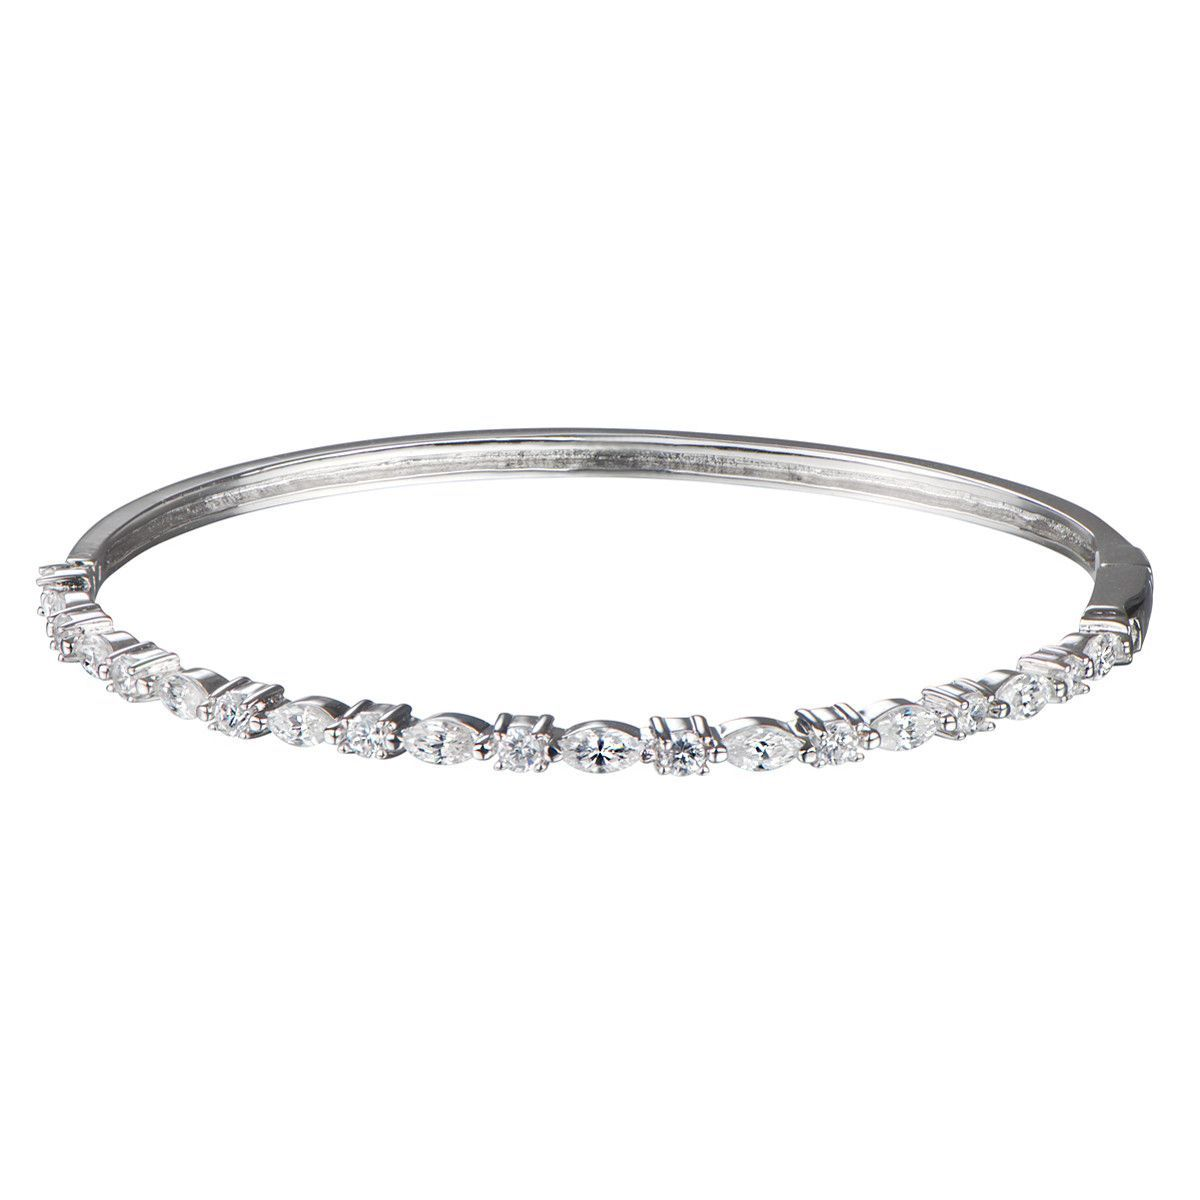 Idette's Round and Marquise Cut CZ Bangle Bracelet